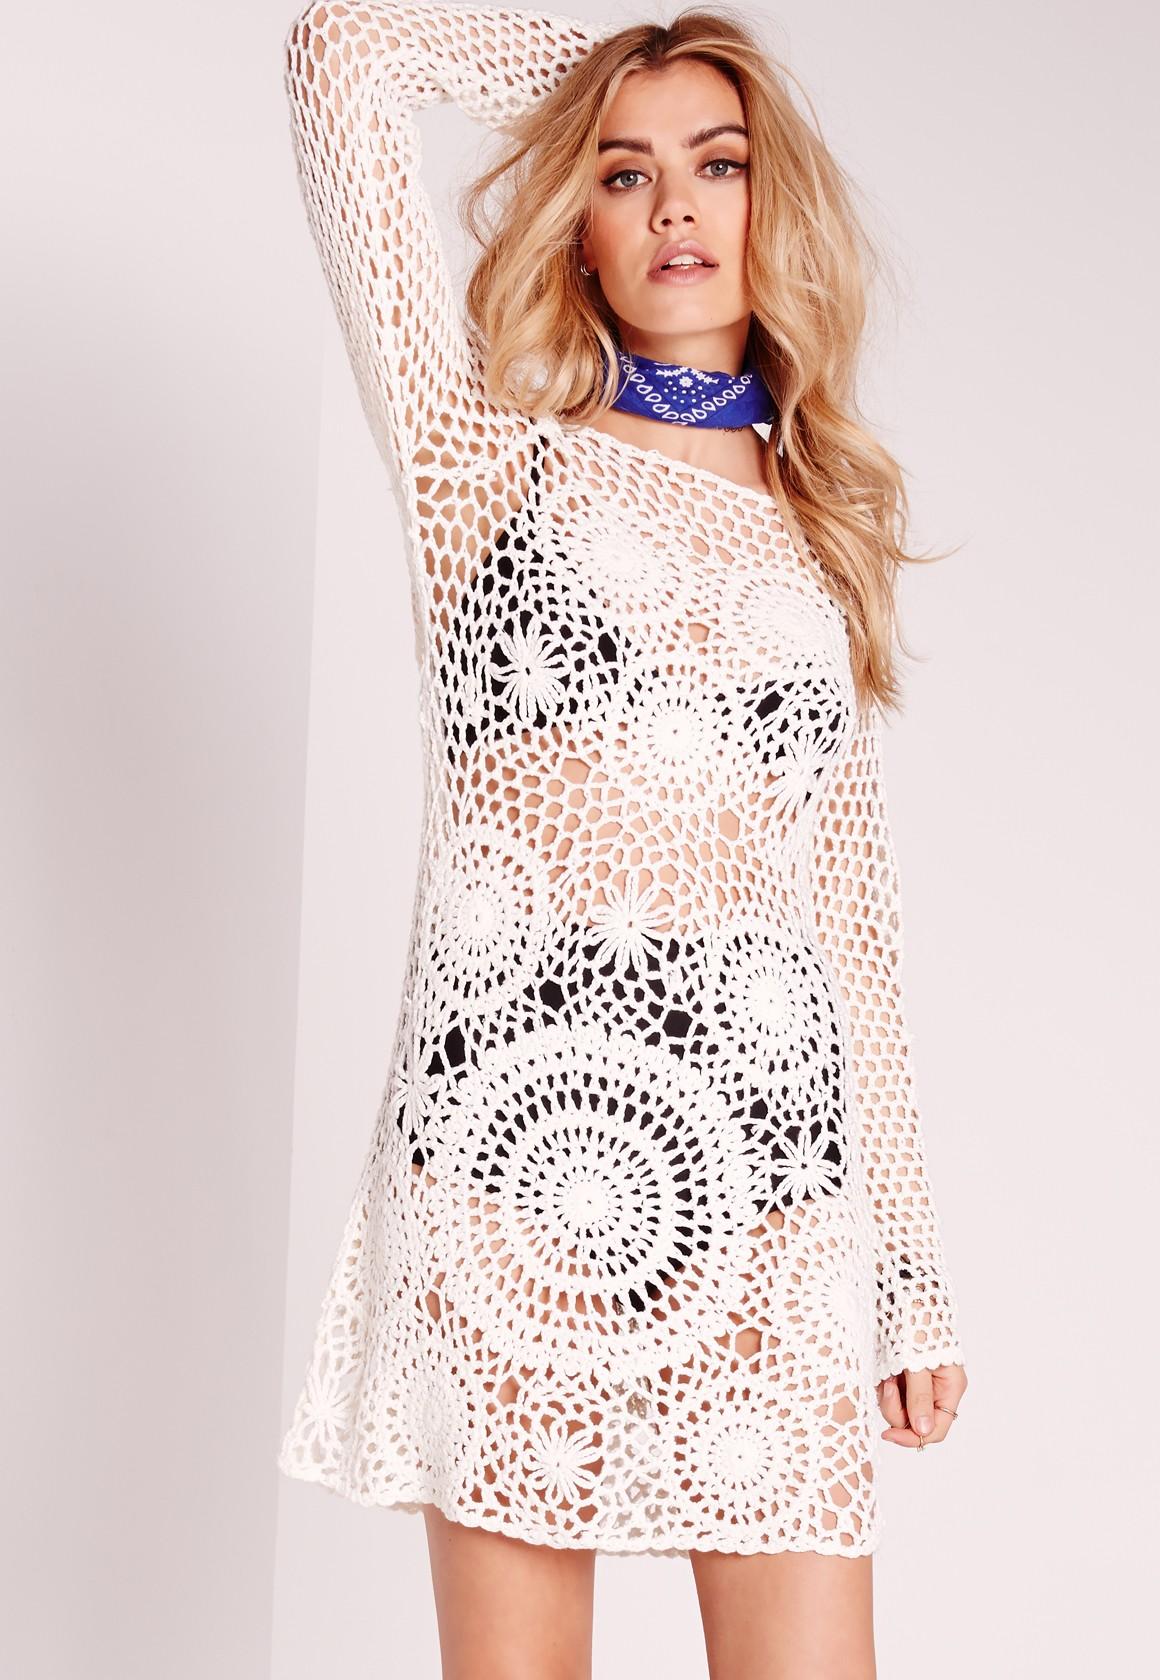 Missguided Crotchet Dress